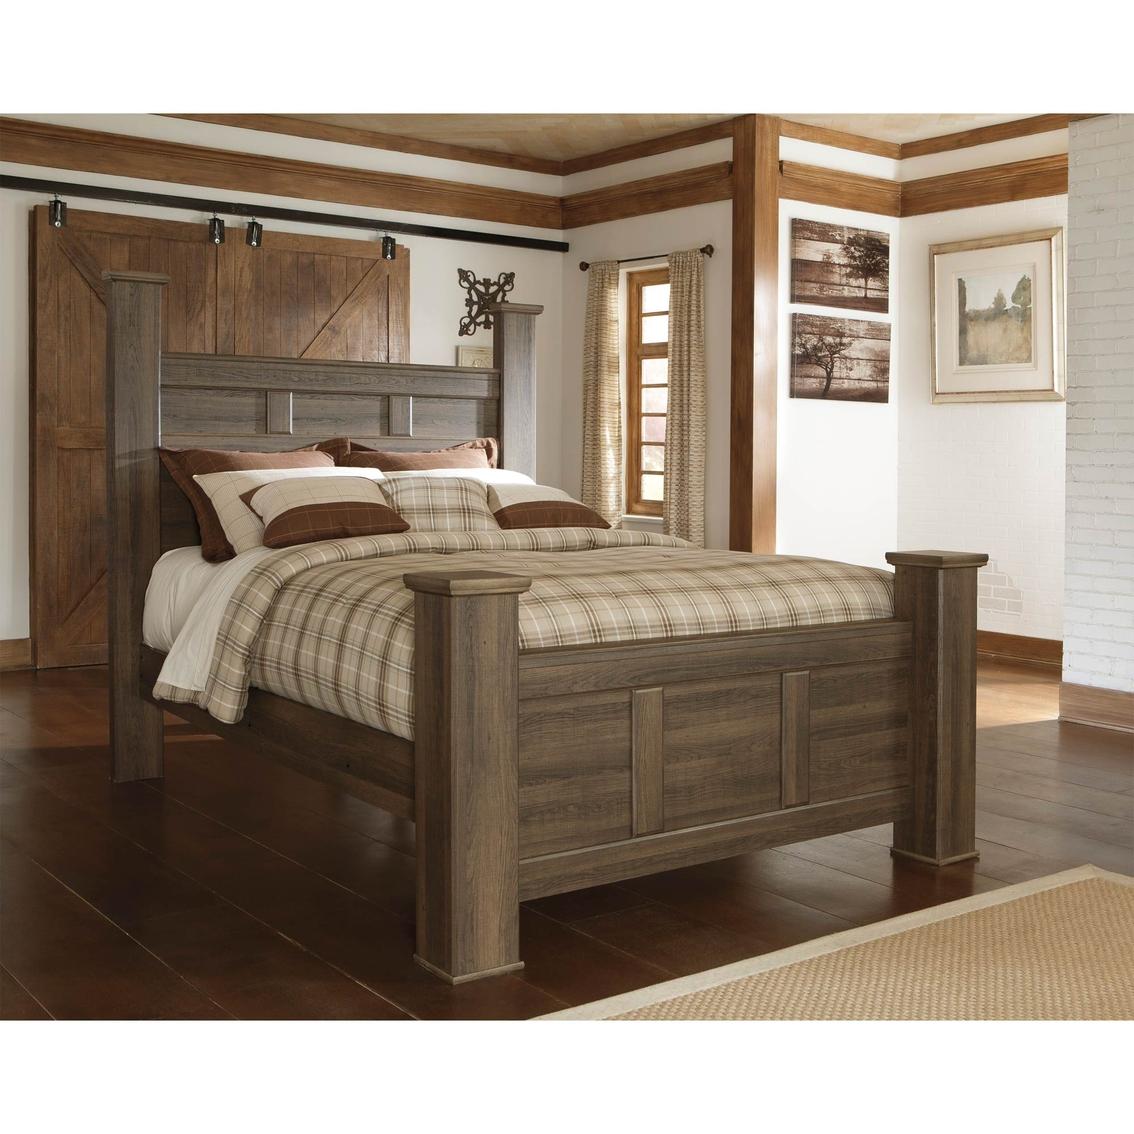 Oak Express Bedroom Sets Ashley Juararo Queen Poster Bed